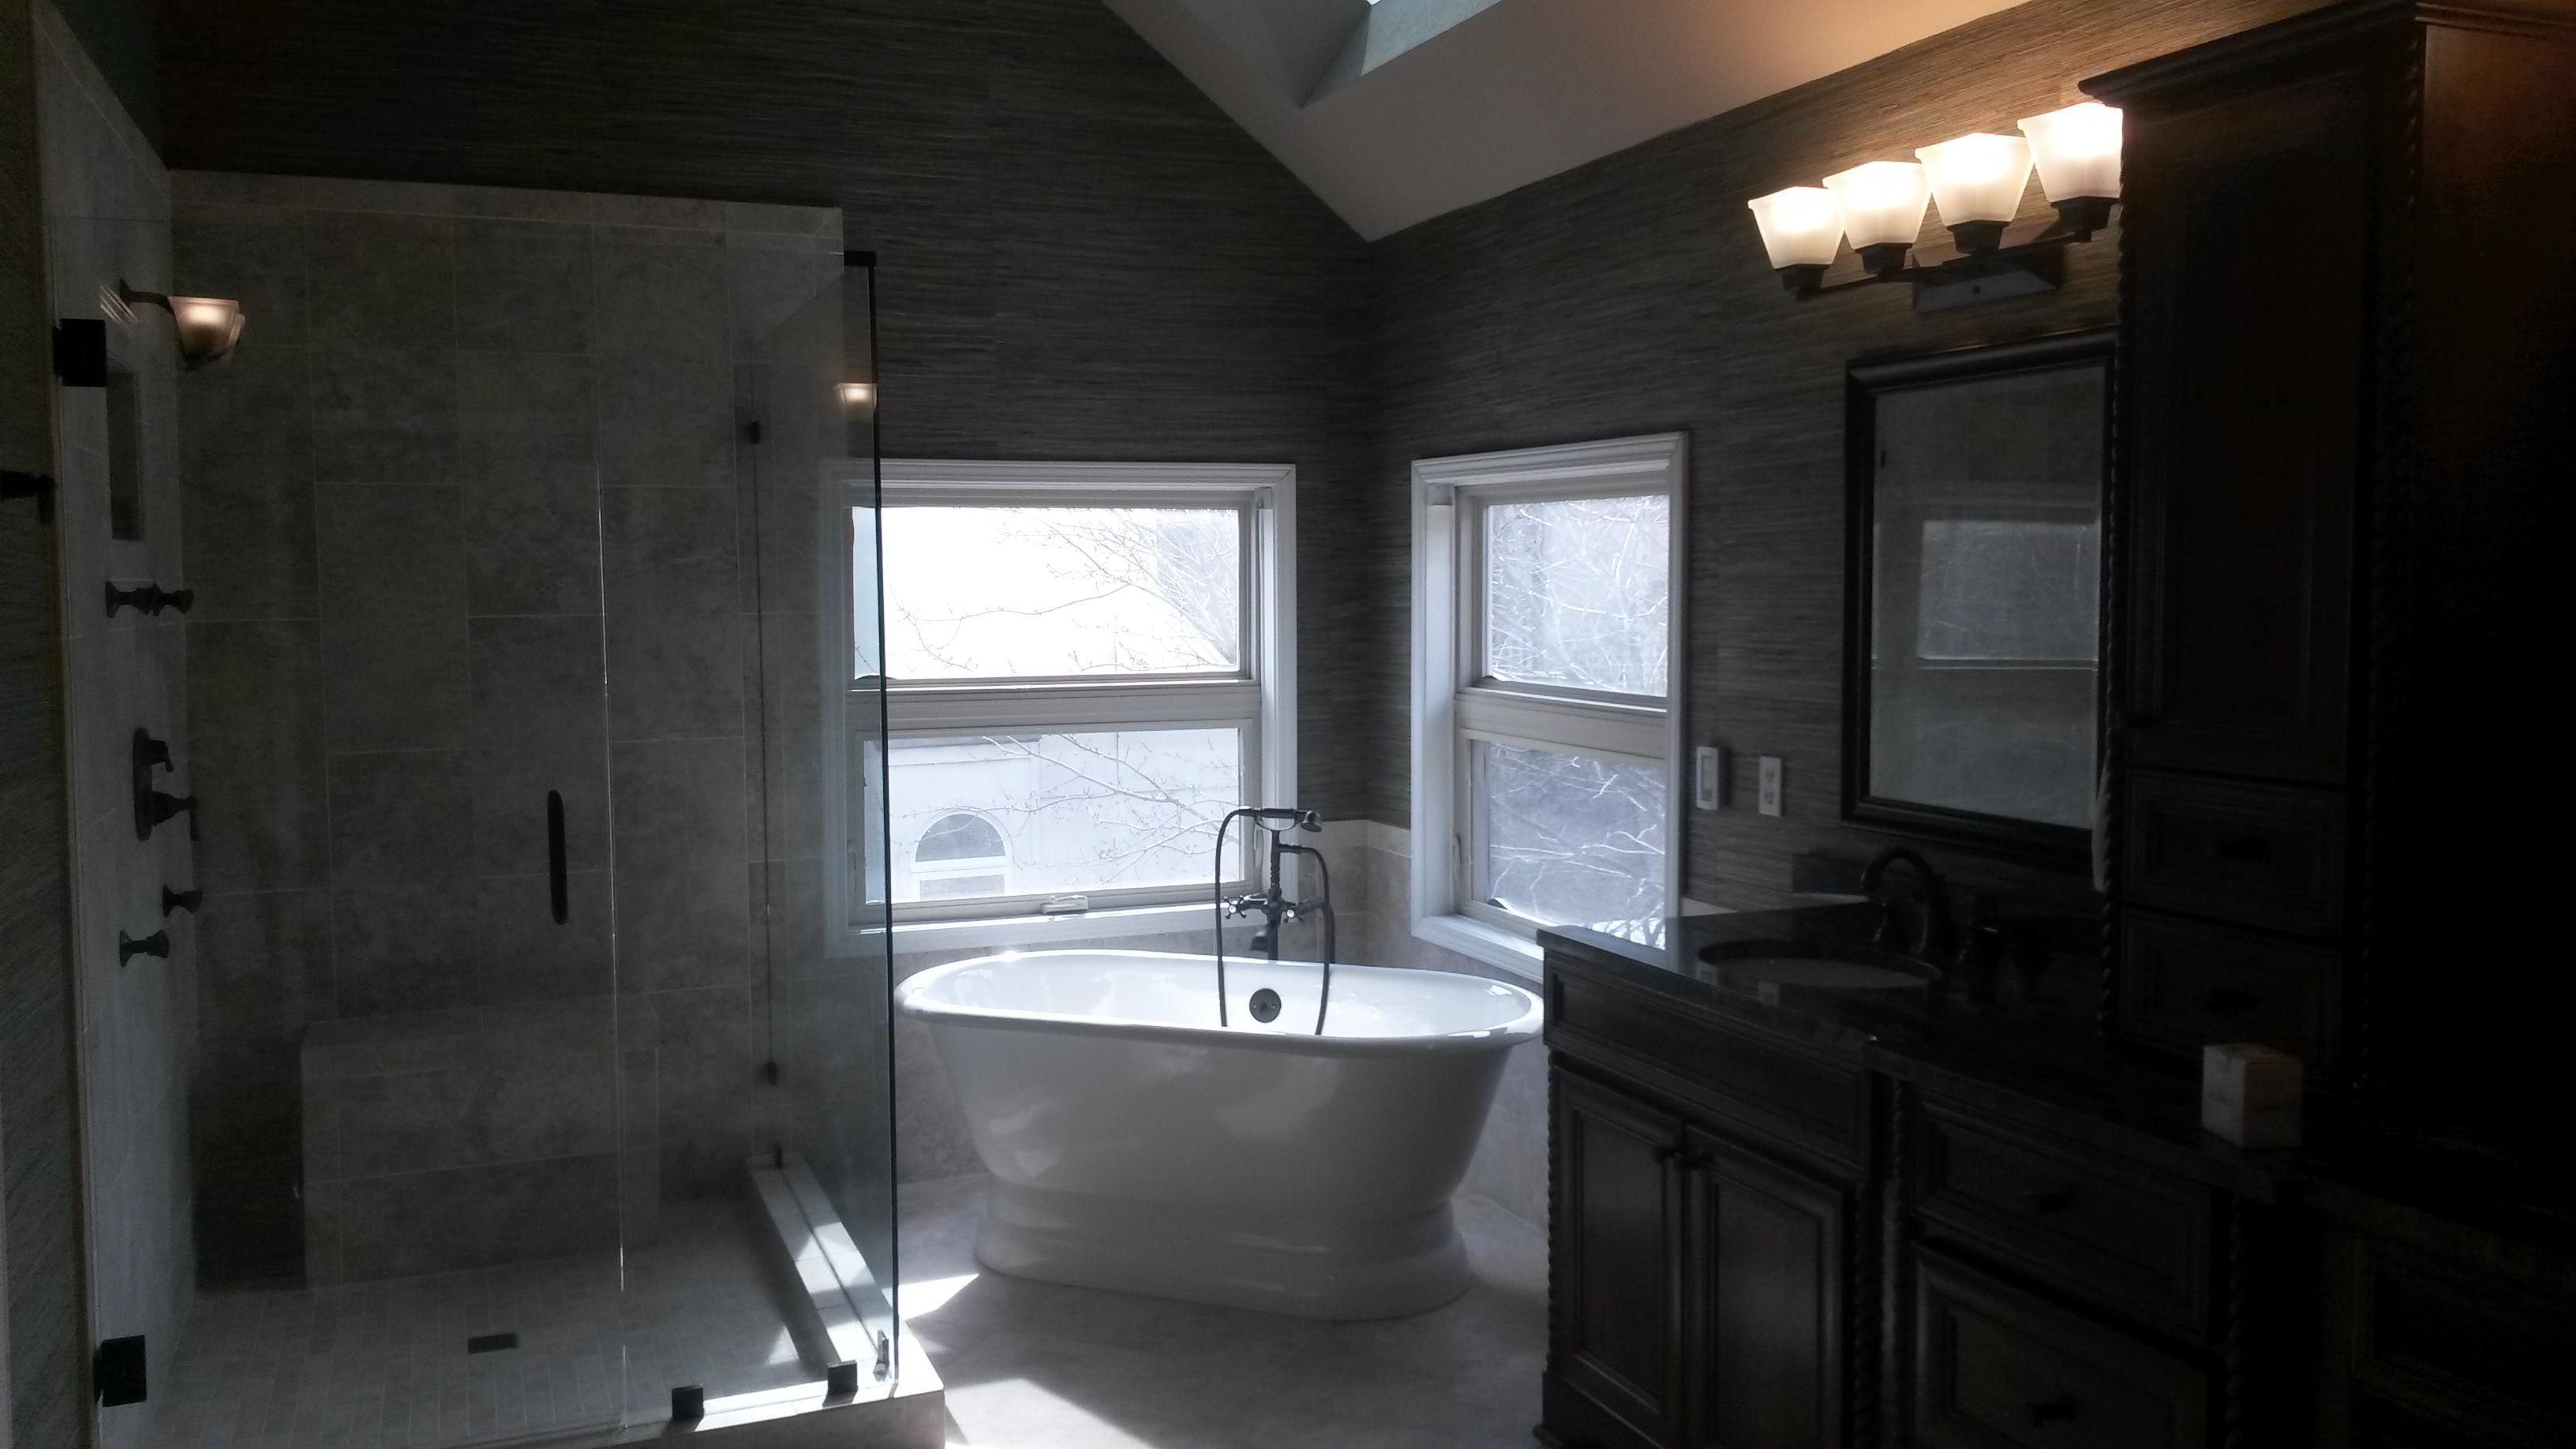 Northstar Home Improvements In Kansas City Mo 816 479 4299